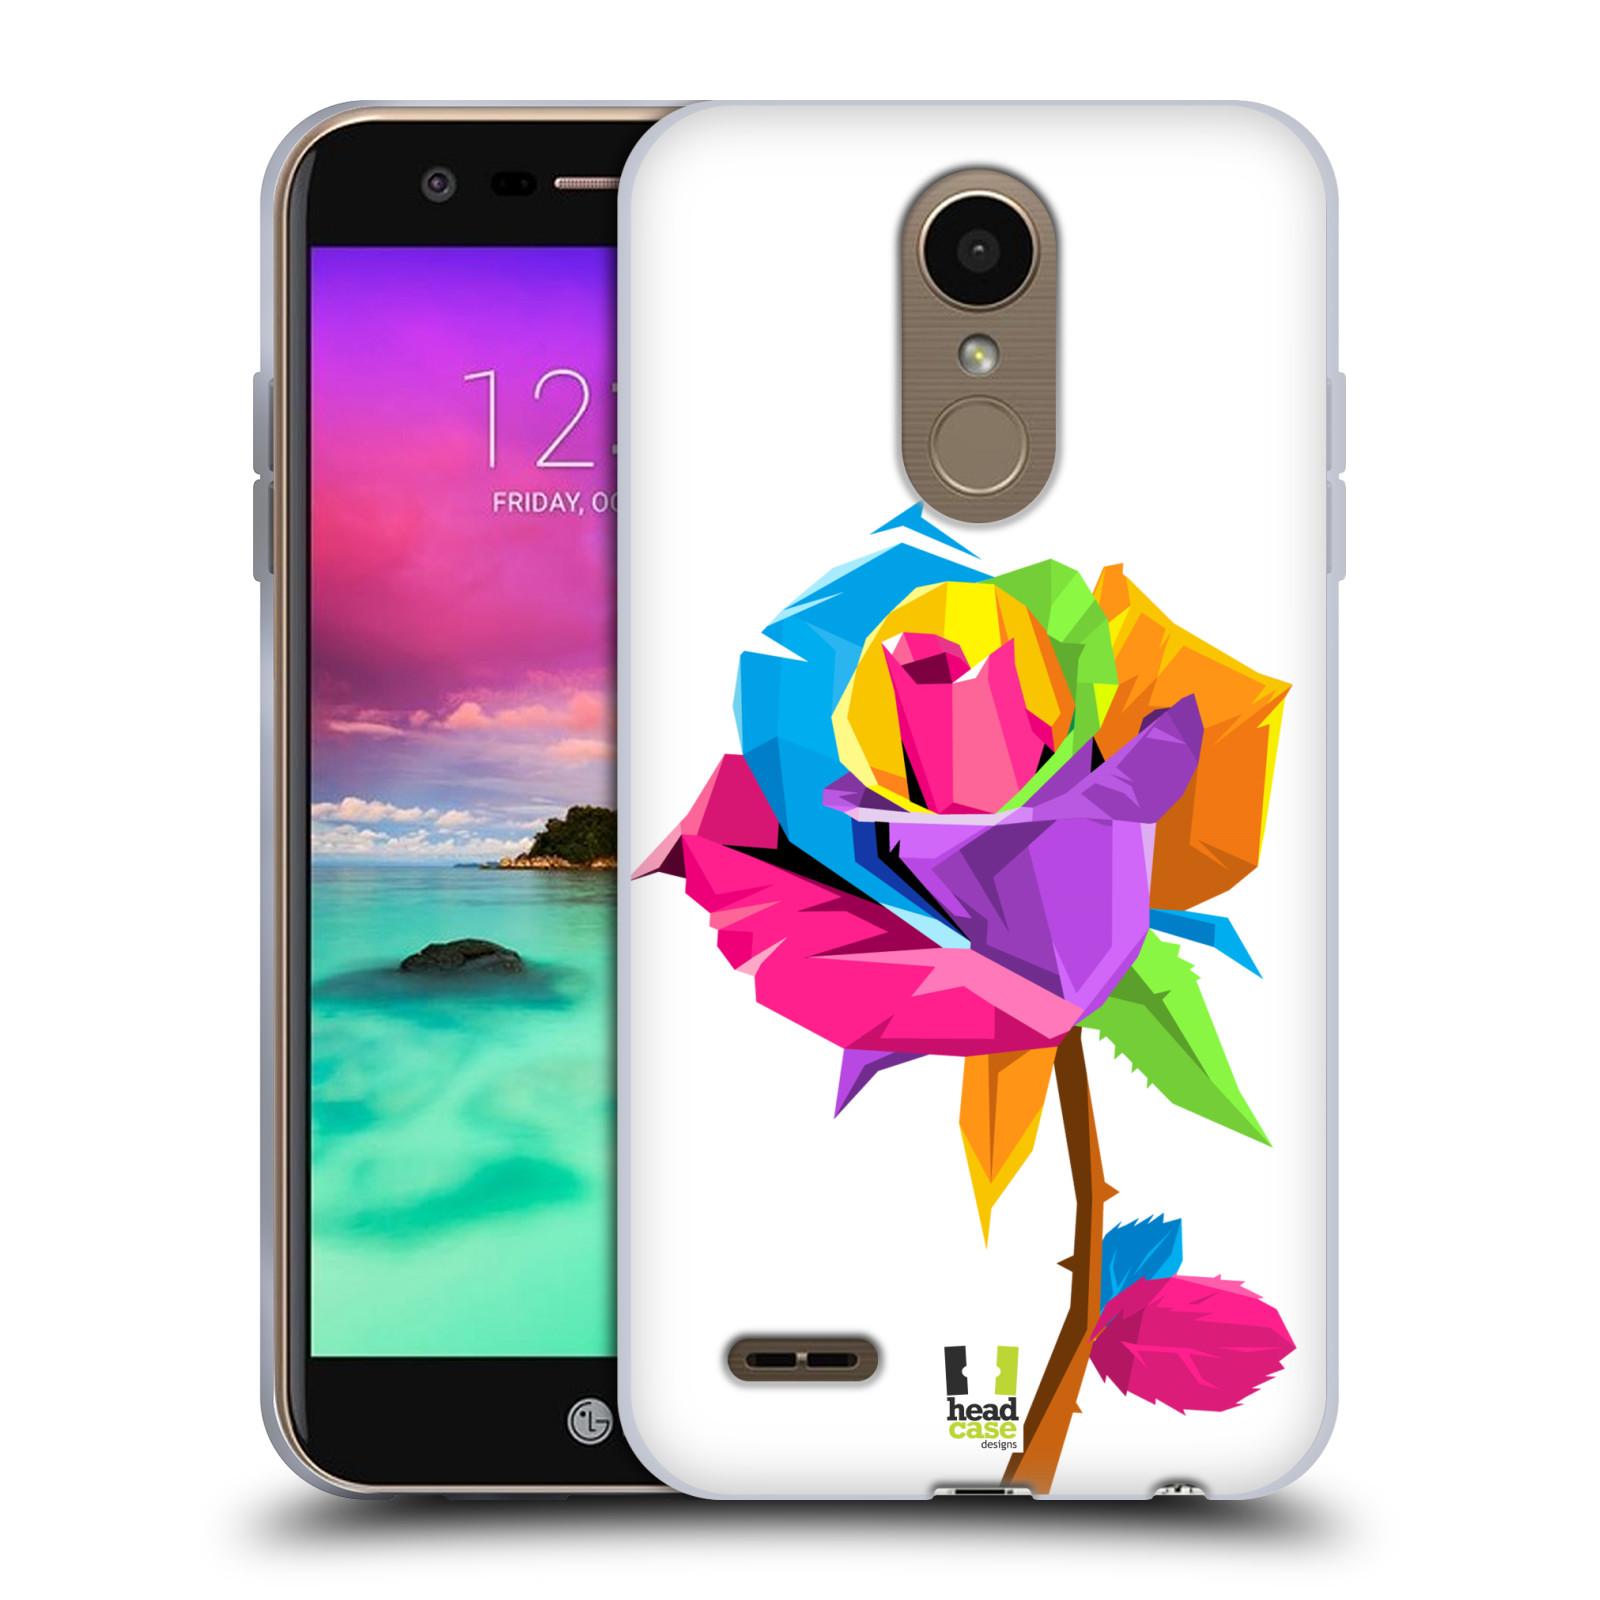 HEAD CASE silikonový obal na mobil LG K11 / K10 2018 vzor POP ART kubismus růže